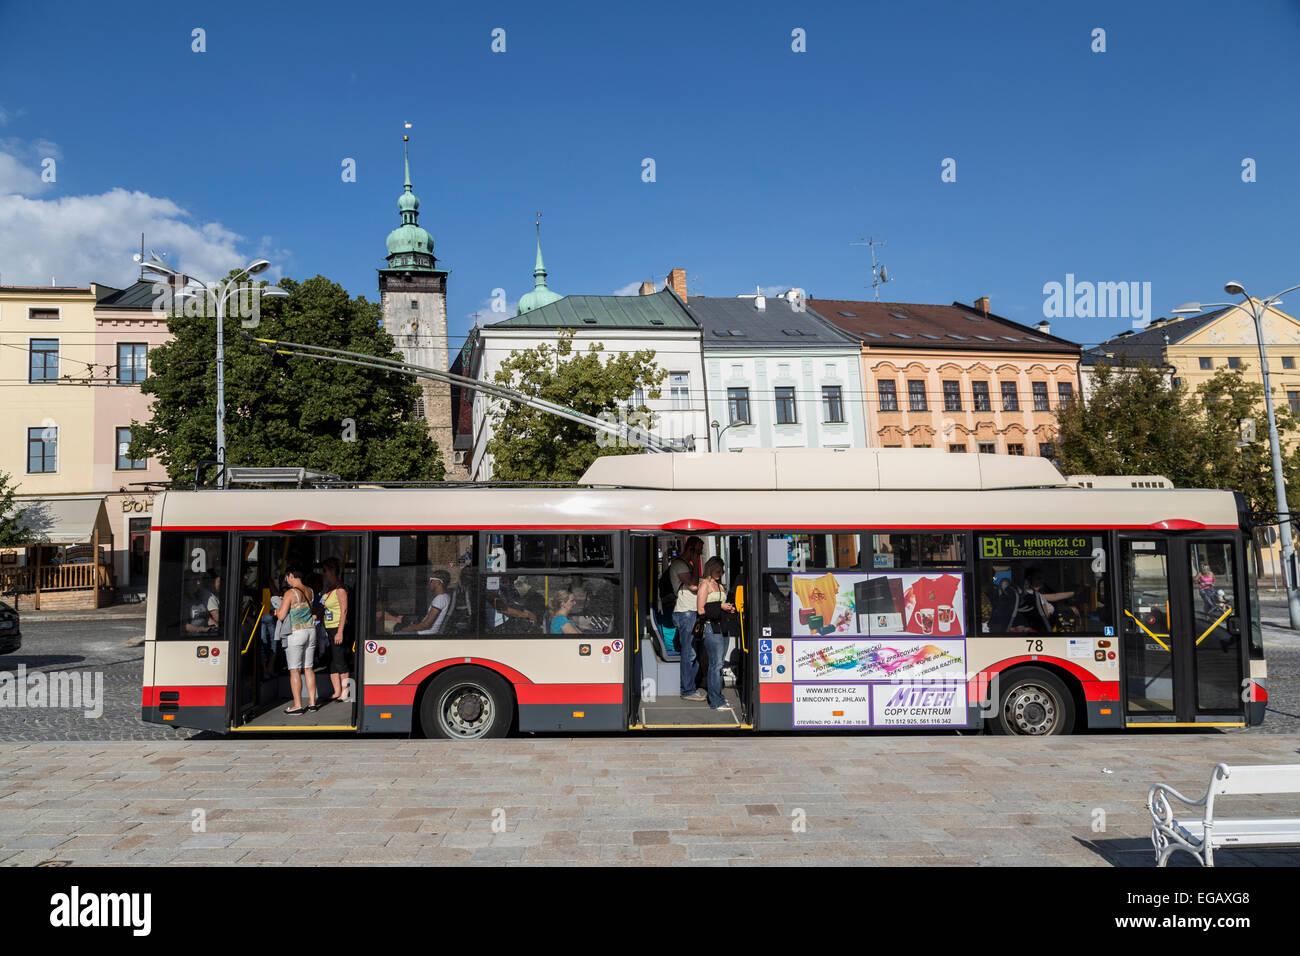 Public transport bus, Jihlava, Czech Republic - Stock Image